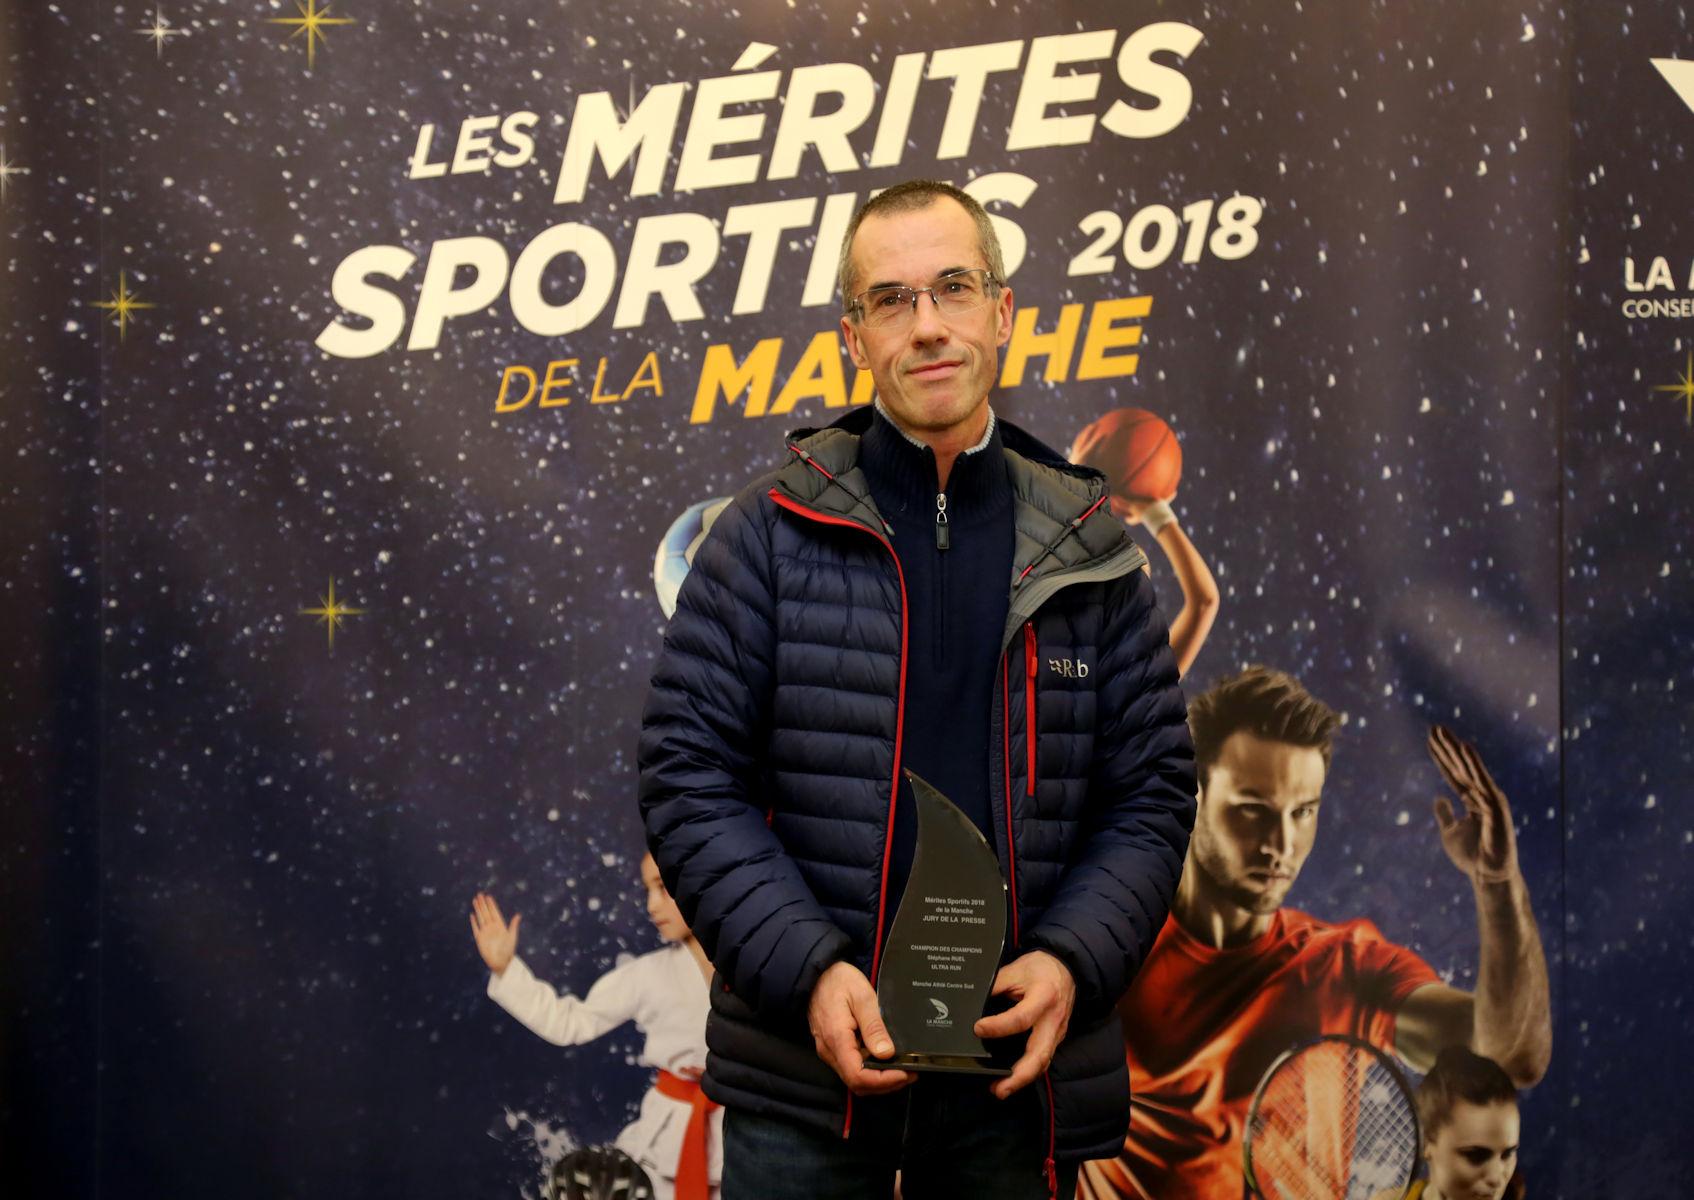 Merites sportifs 2018